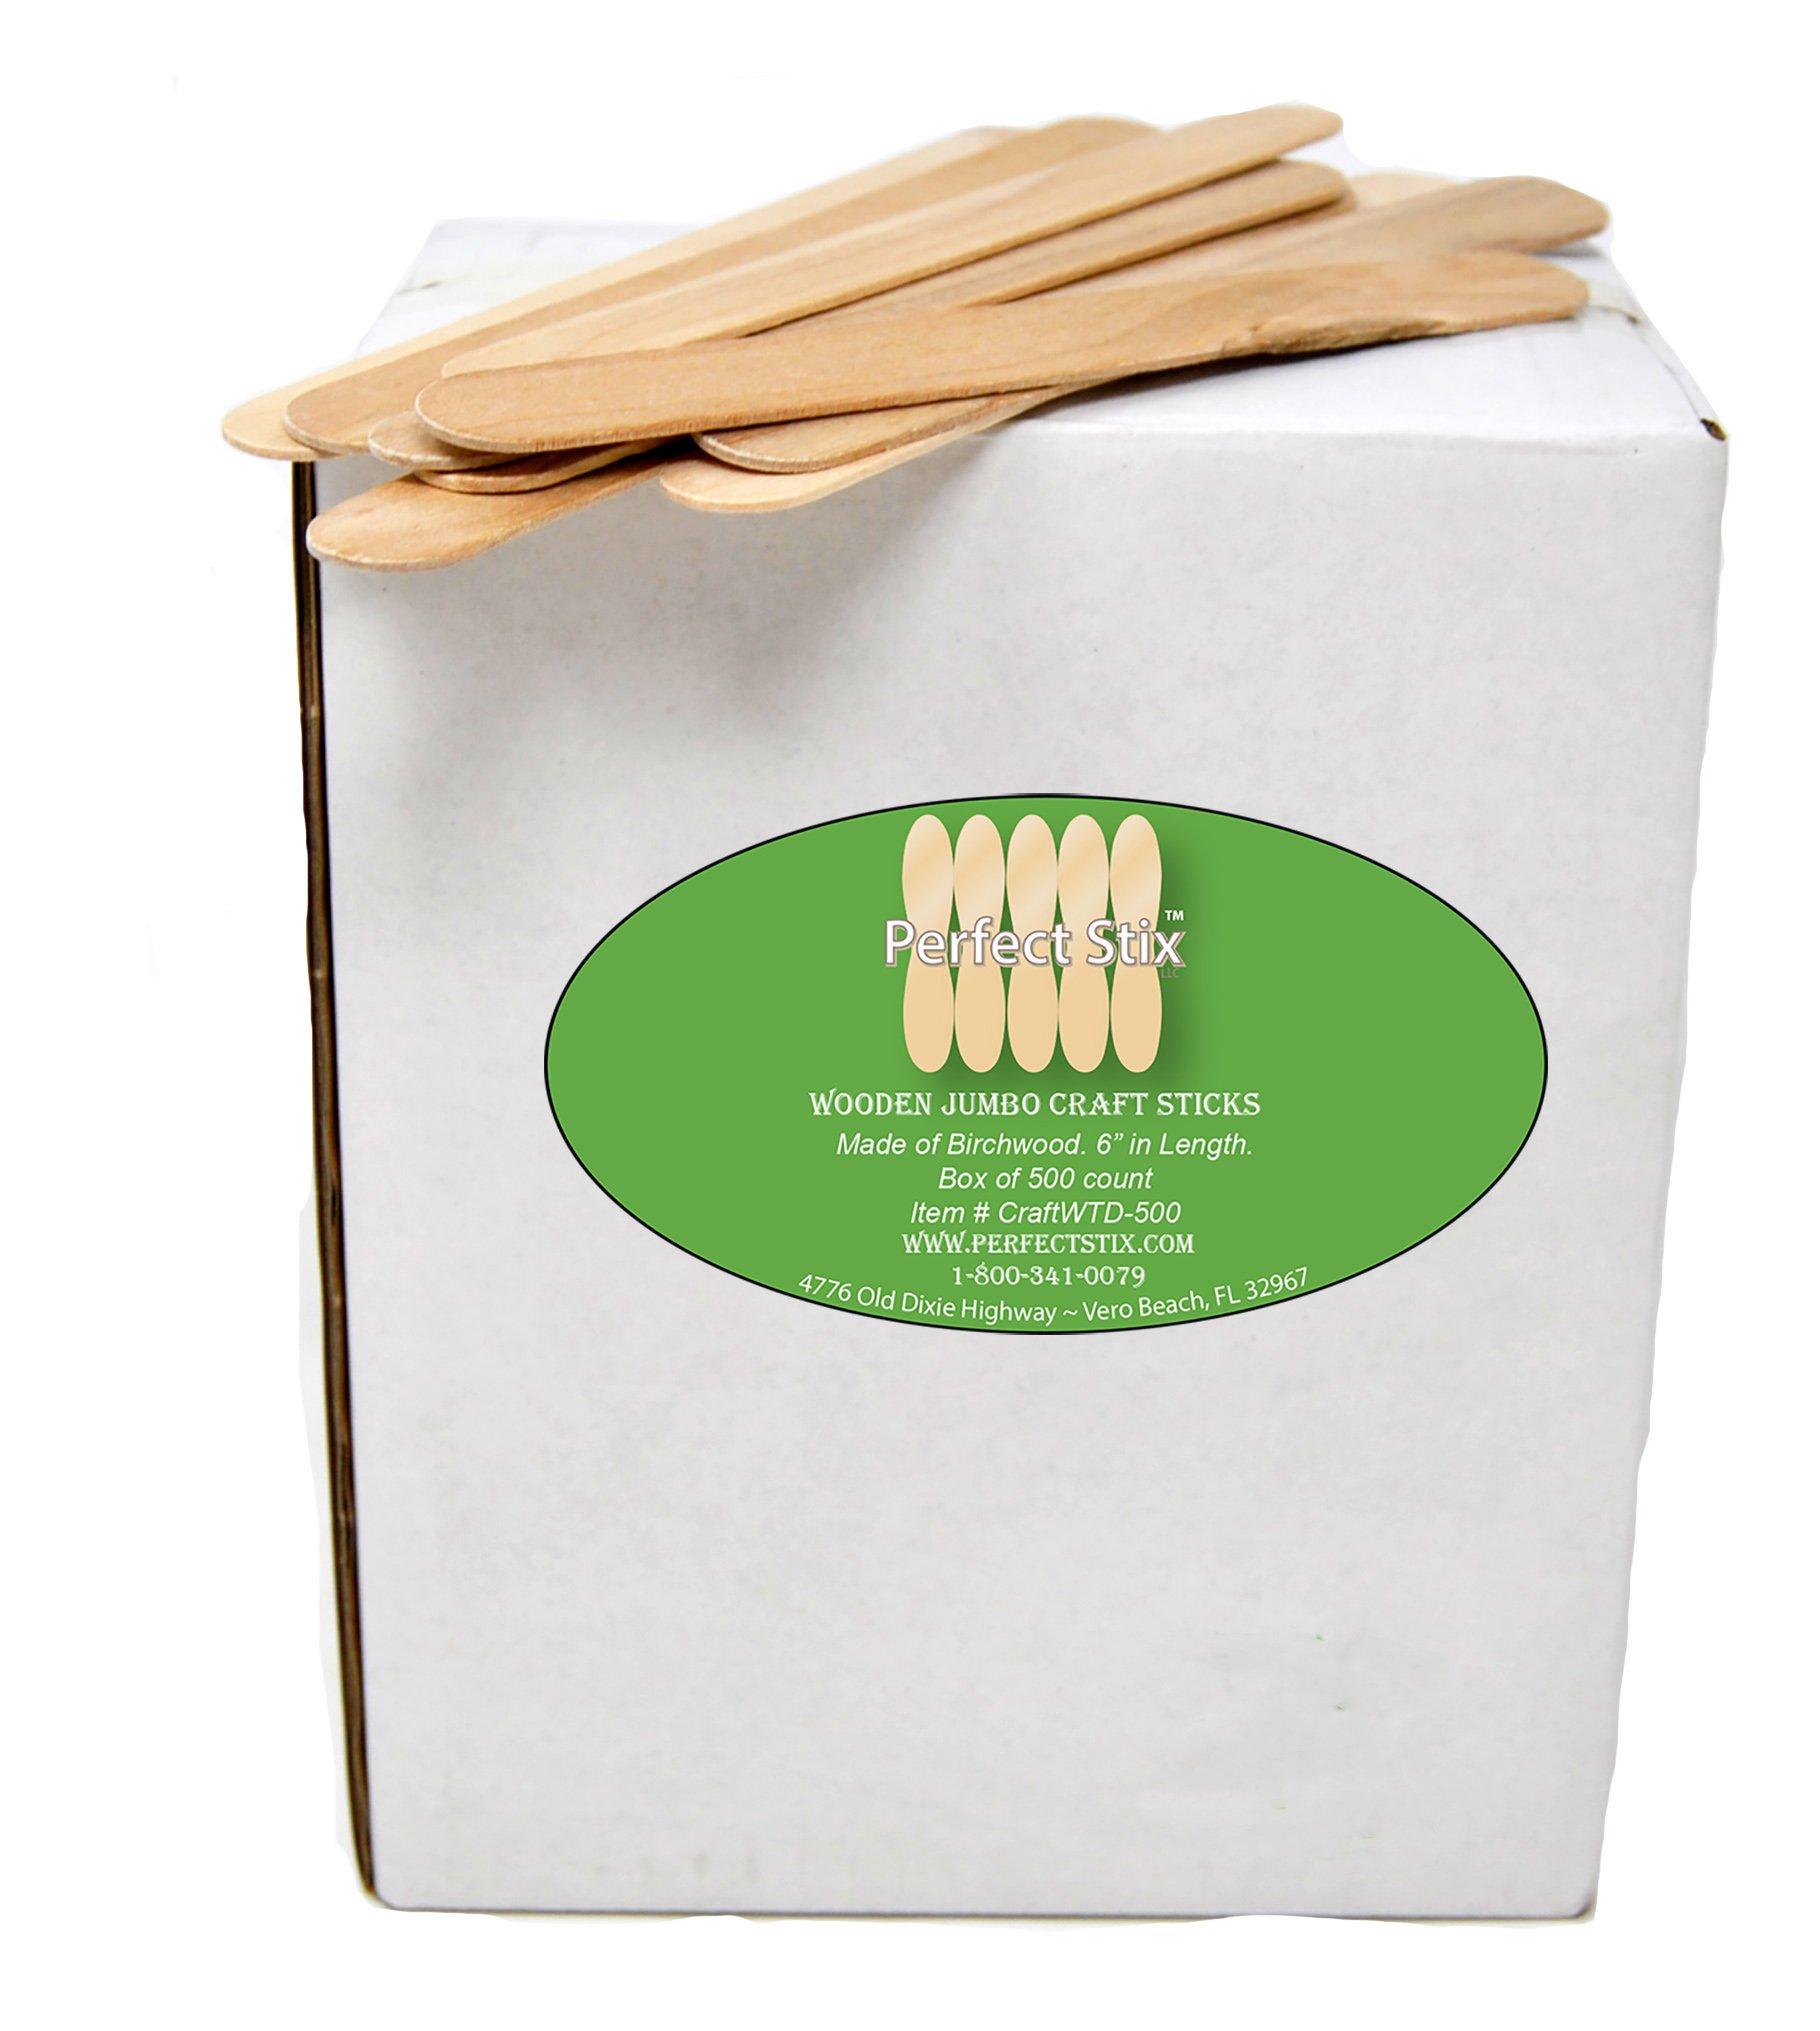 Perfect Stix Jumbo Craft Sticks (Pack of 500ct)